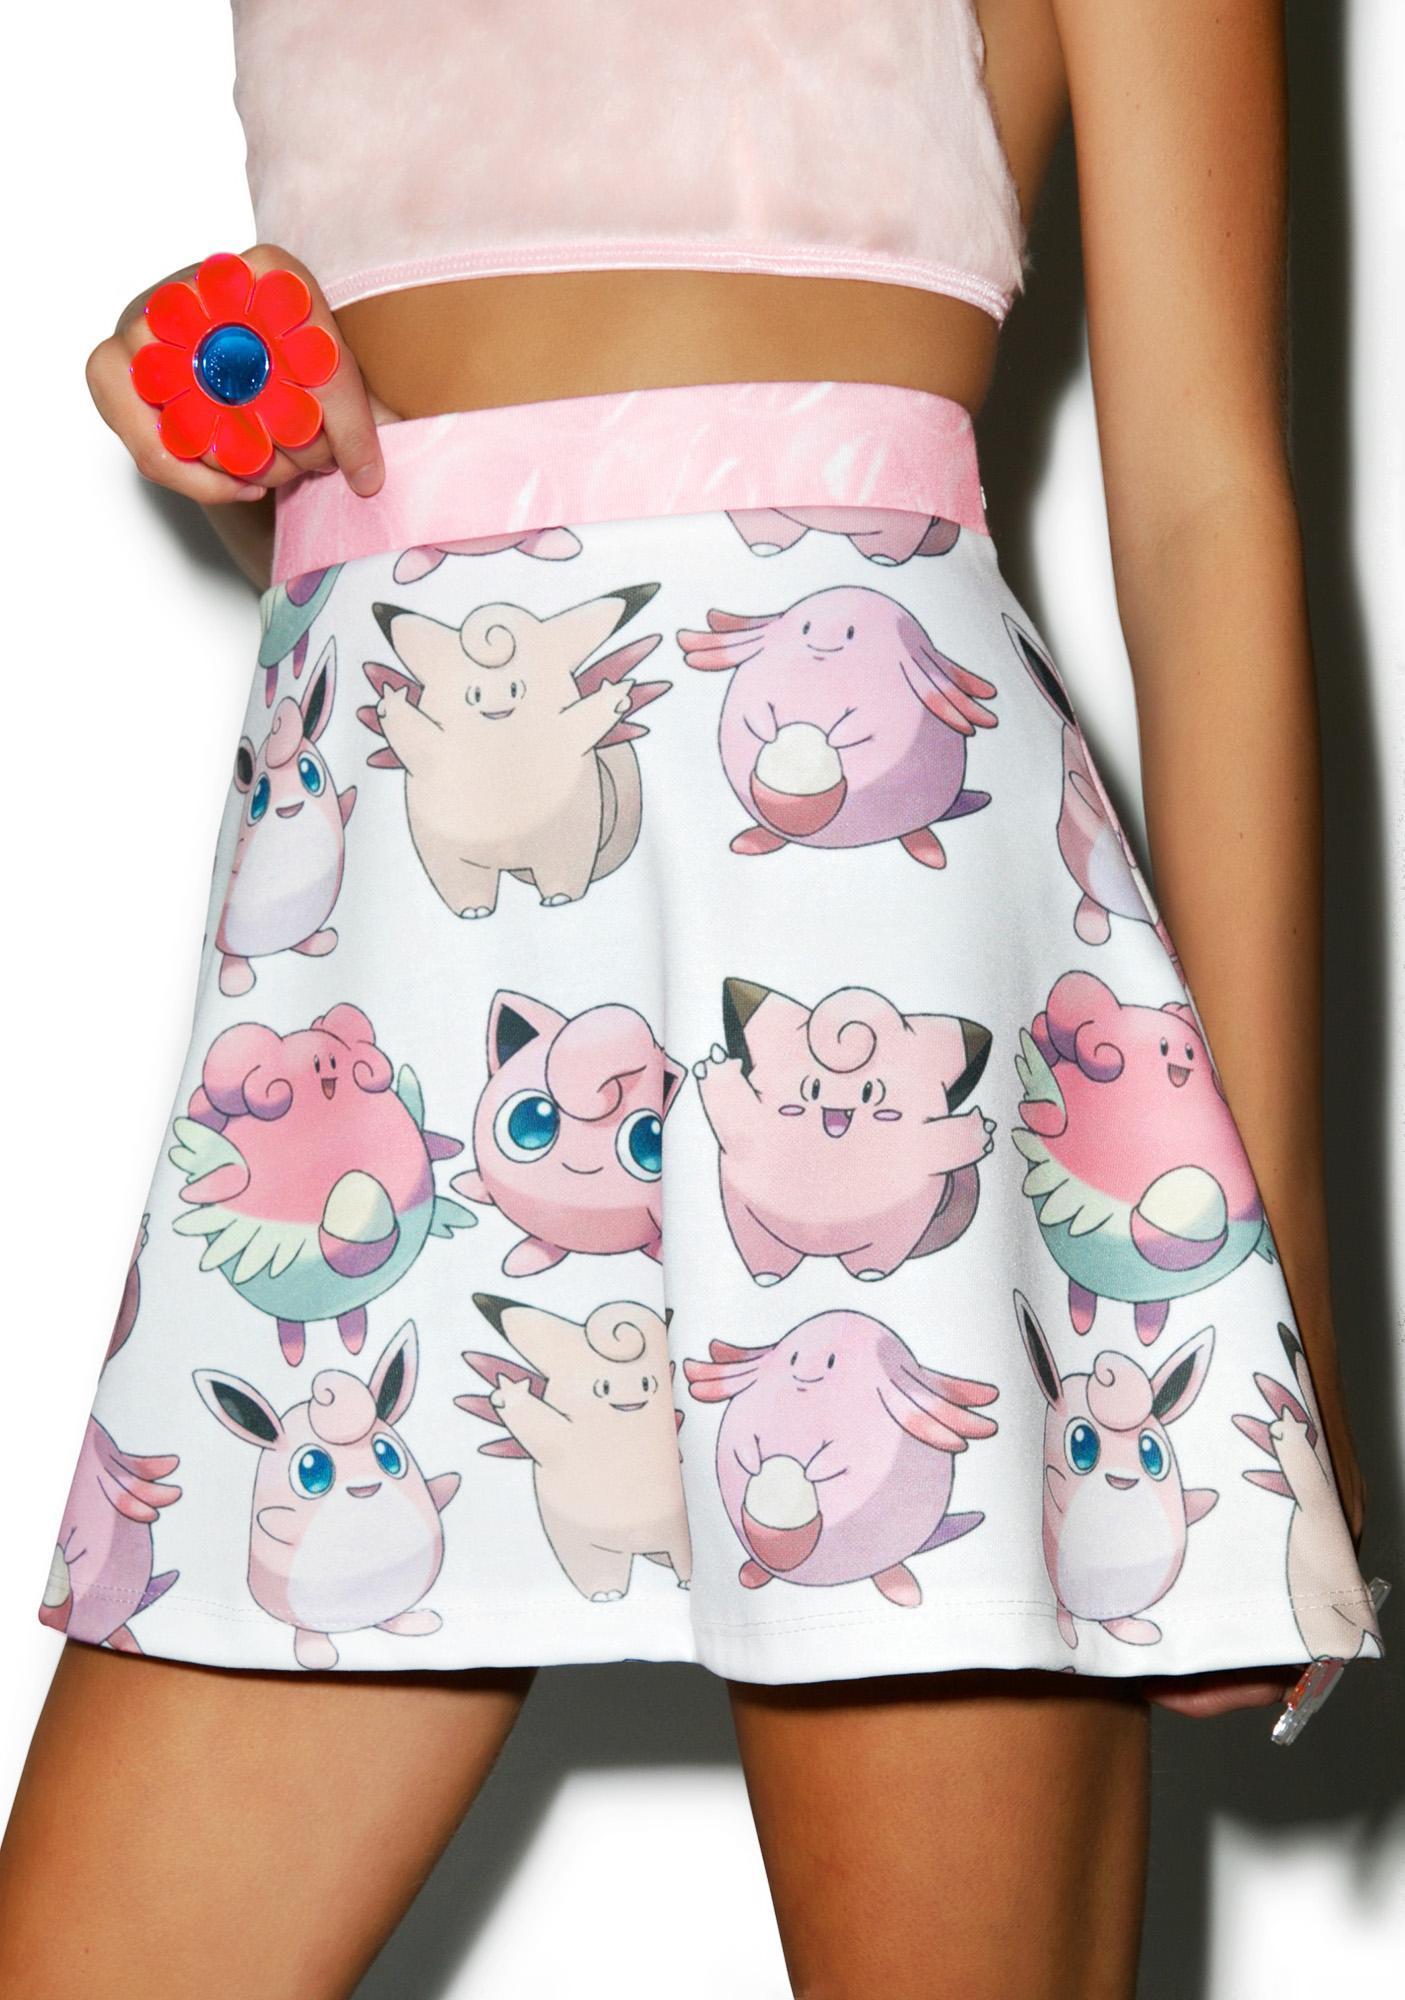 Poke Me Mon Skirt